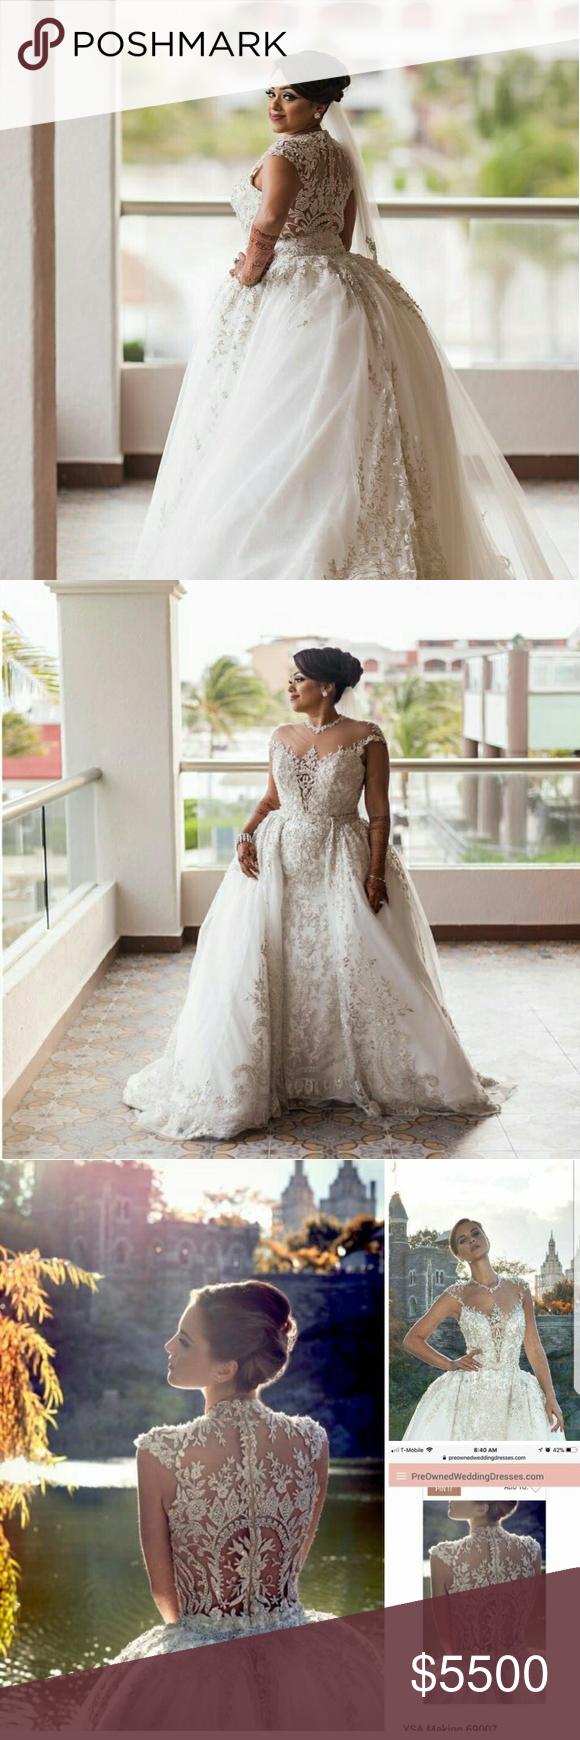 Wedding dress Ysa makino 69007. Beautiful bridal gown